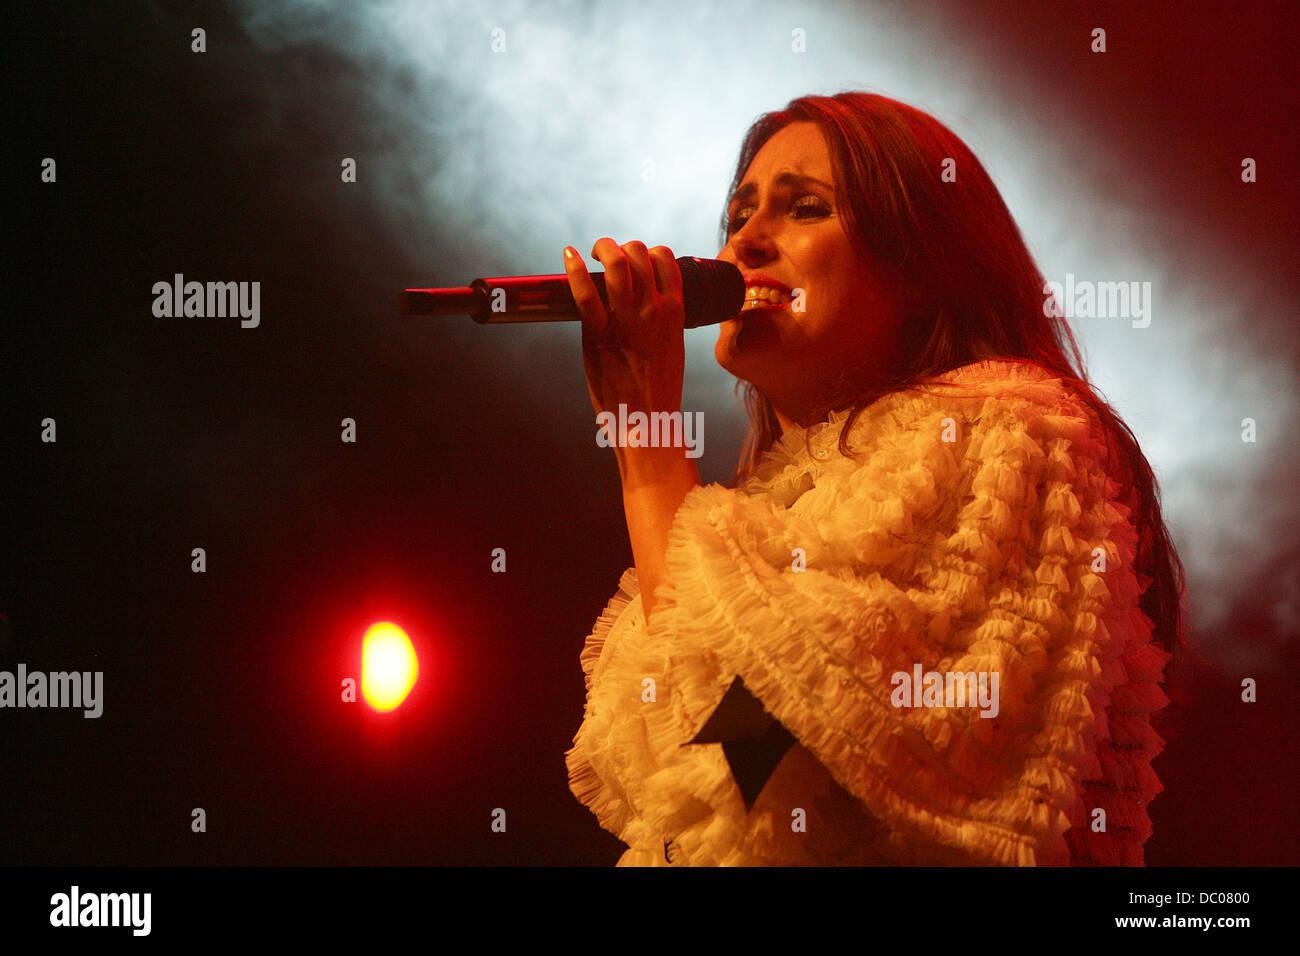 Sharon Den Adel of dutch band, Within Temptation performing at  Filmfestival. Utrecht, Holland